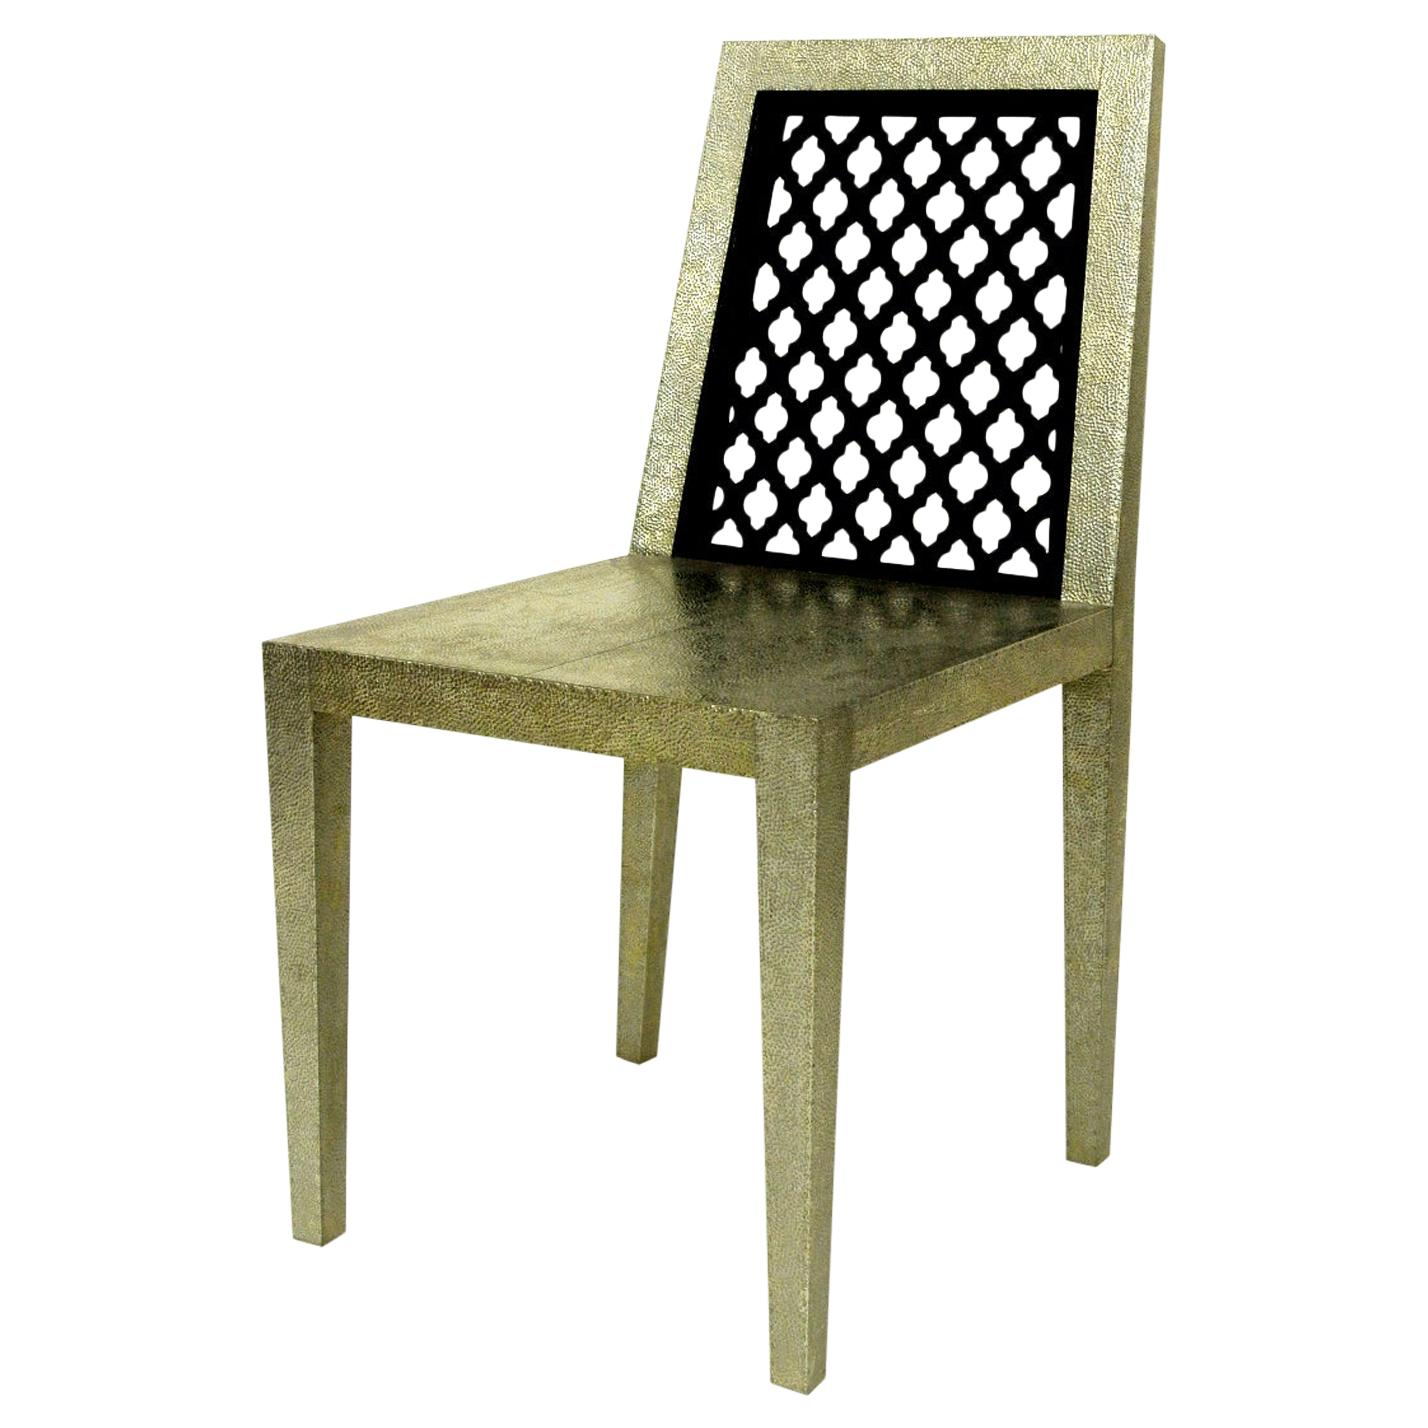 Jour Jali Back Chair by Paul Mathieu for Stephanie Odegard